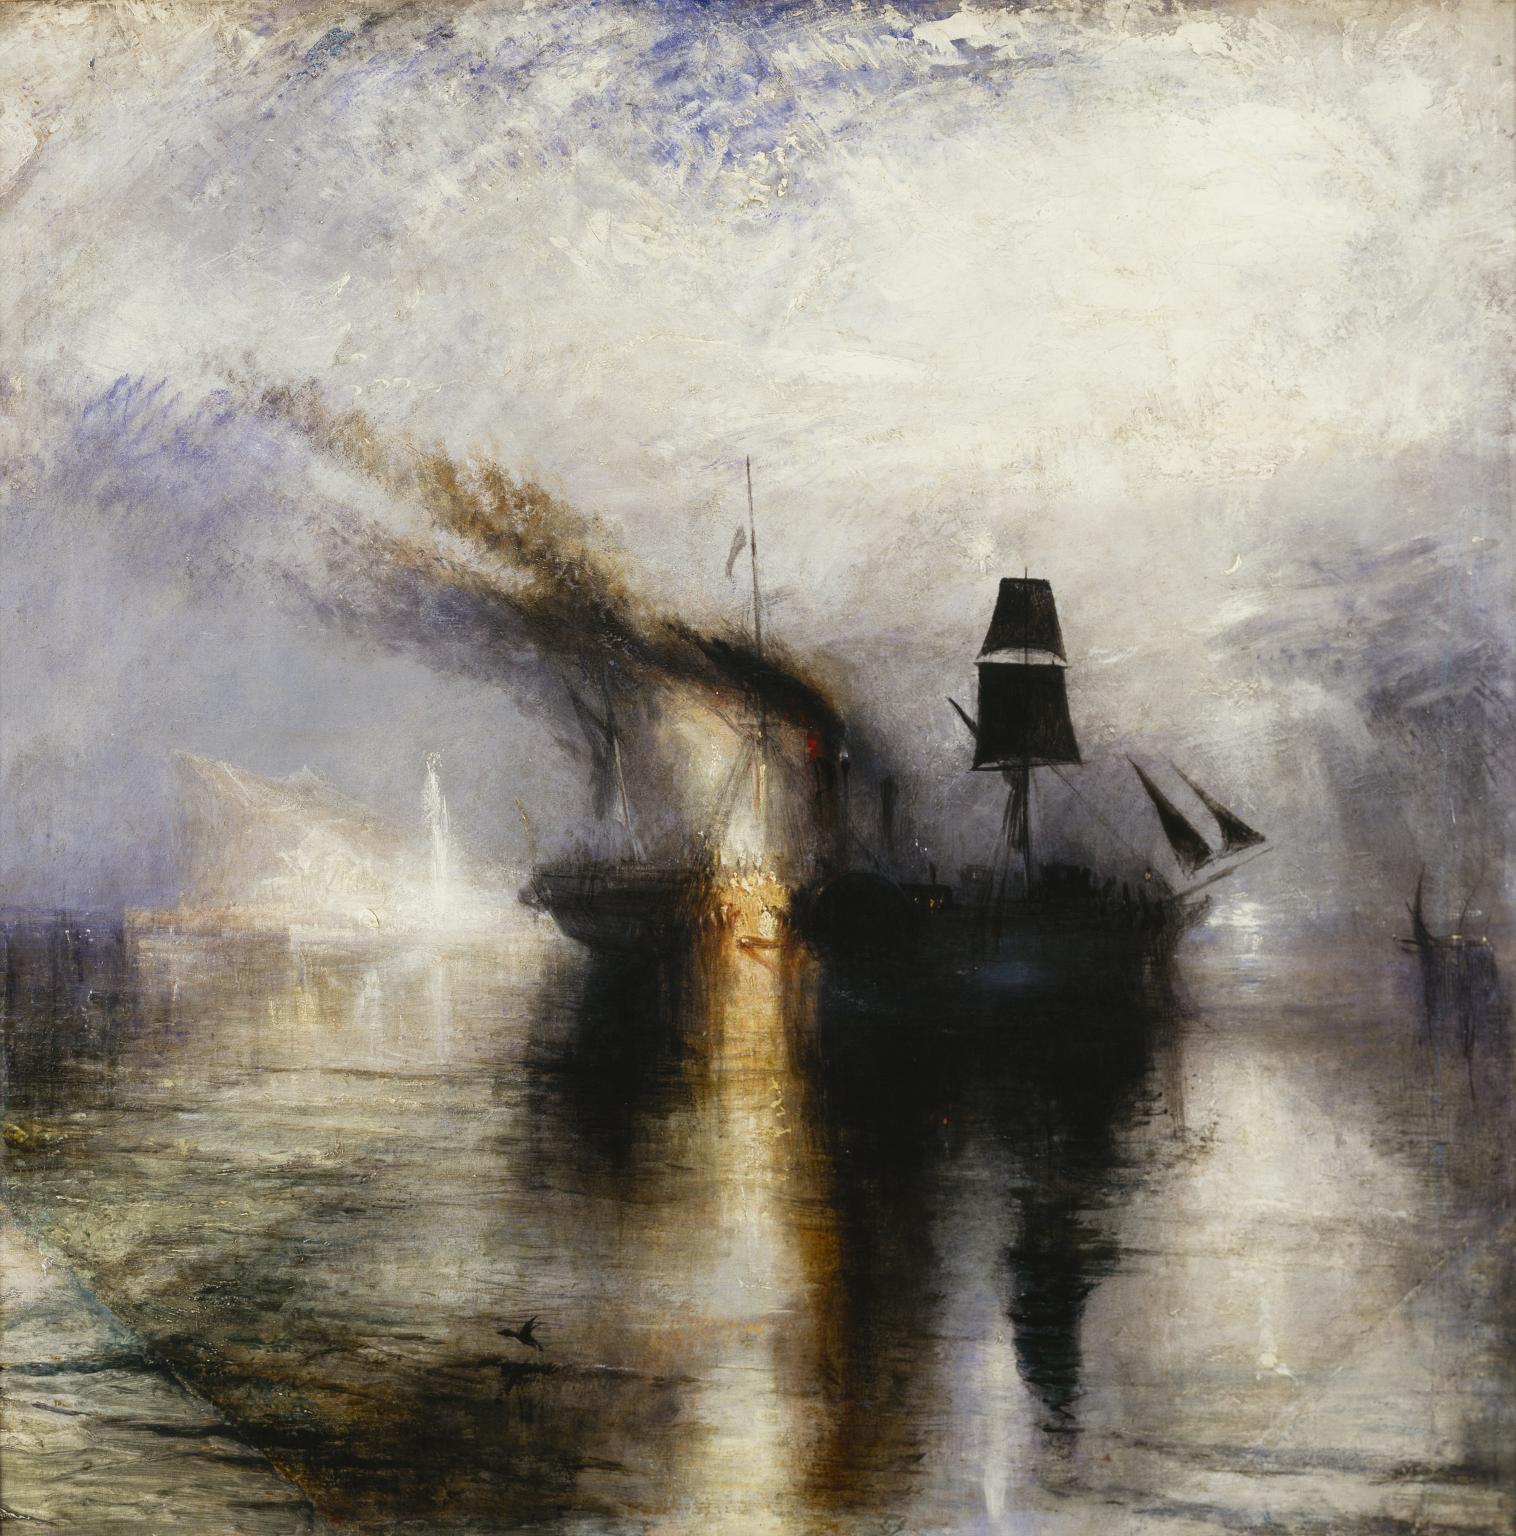 Figure 2. Joseph Mallord William Turner, Peace—Burial at Sea, 1842, oil on canvas, 87 x 87 cm, Tate Britain, London.